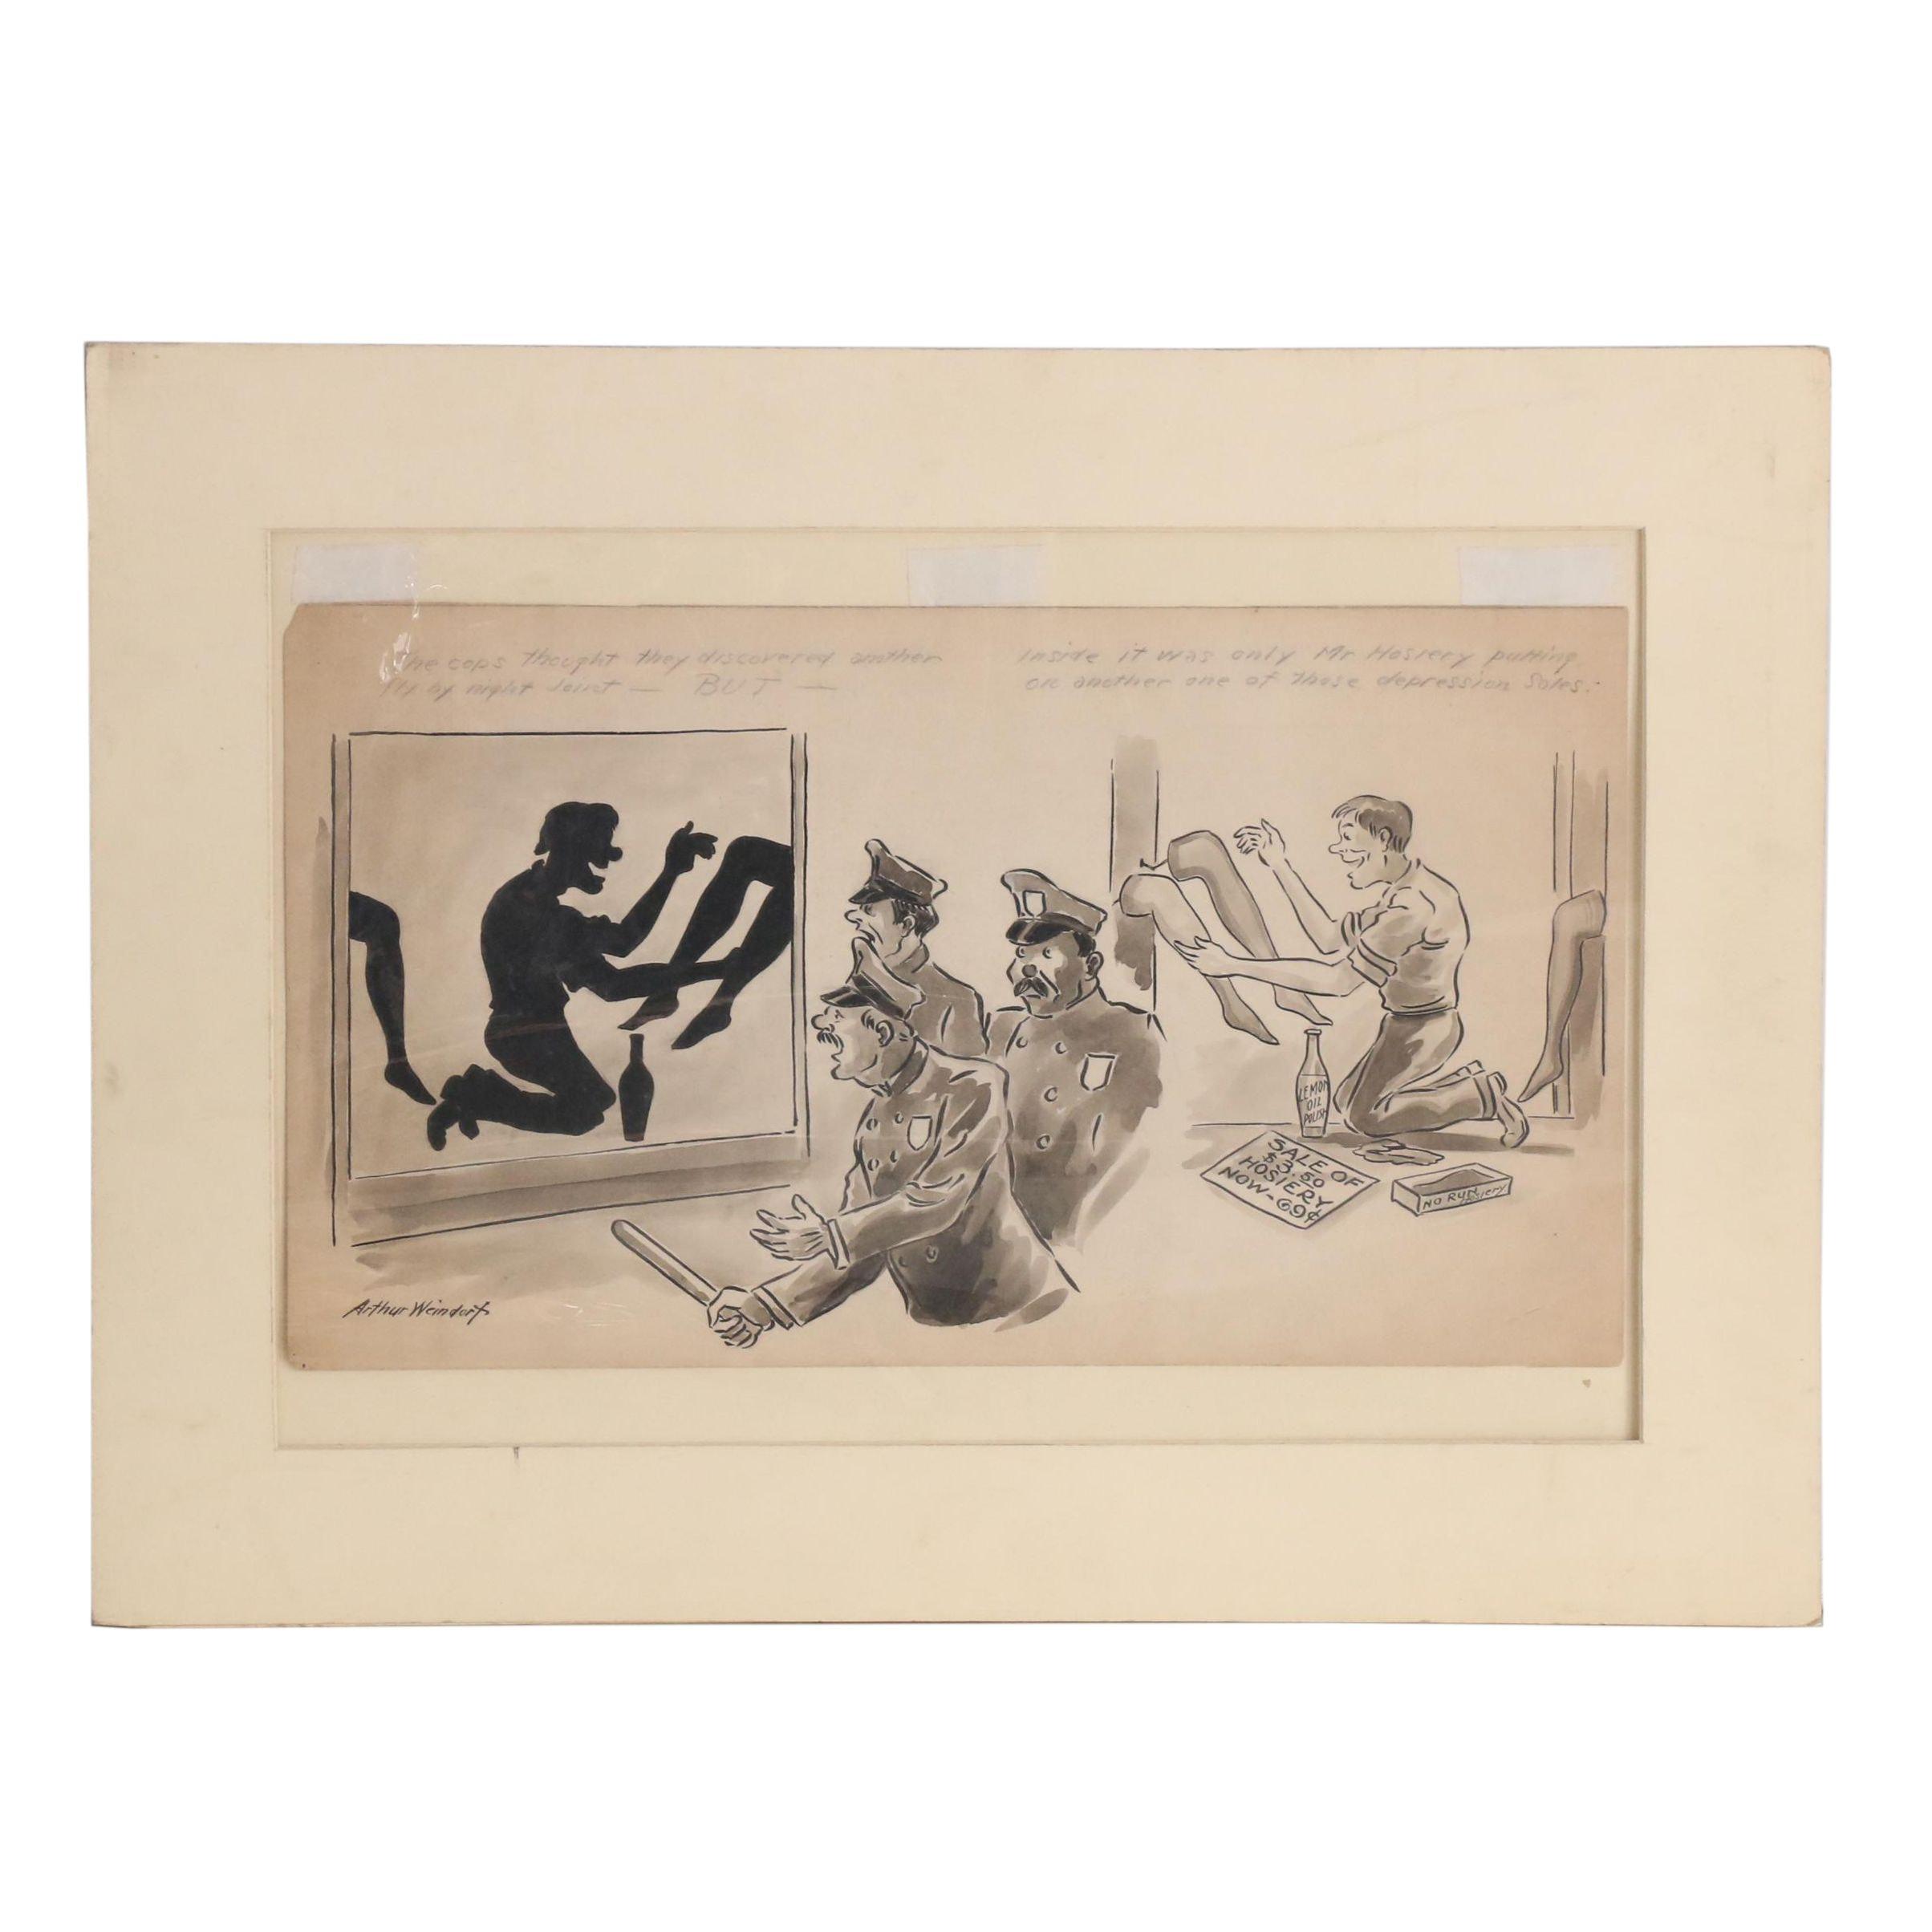 Arthur Weindorf circa 1930 Satirical Ink Illustration